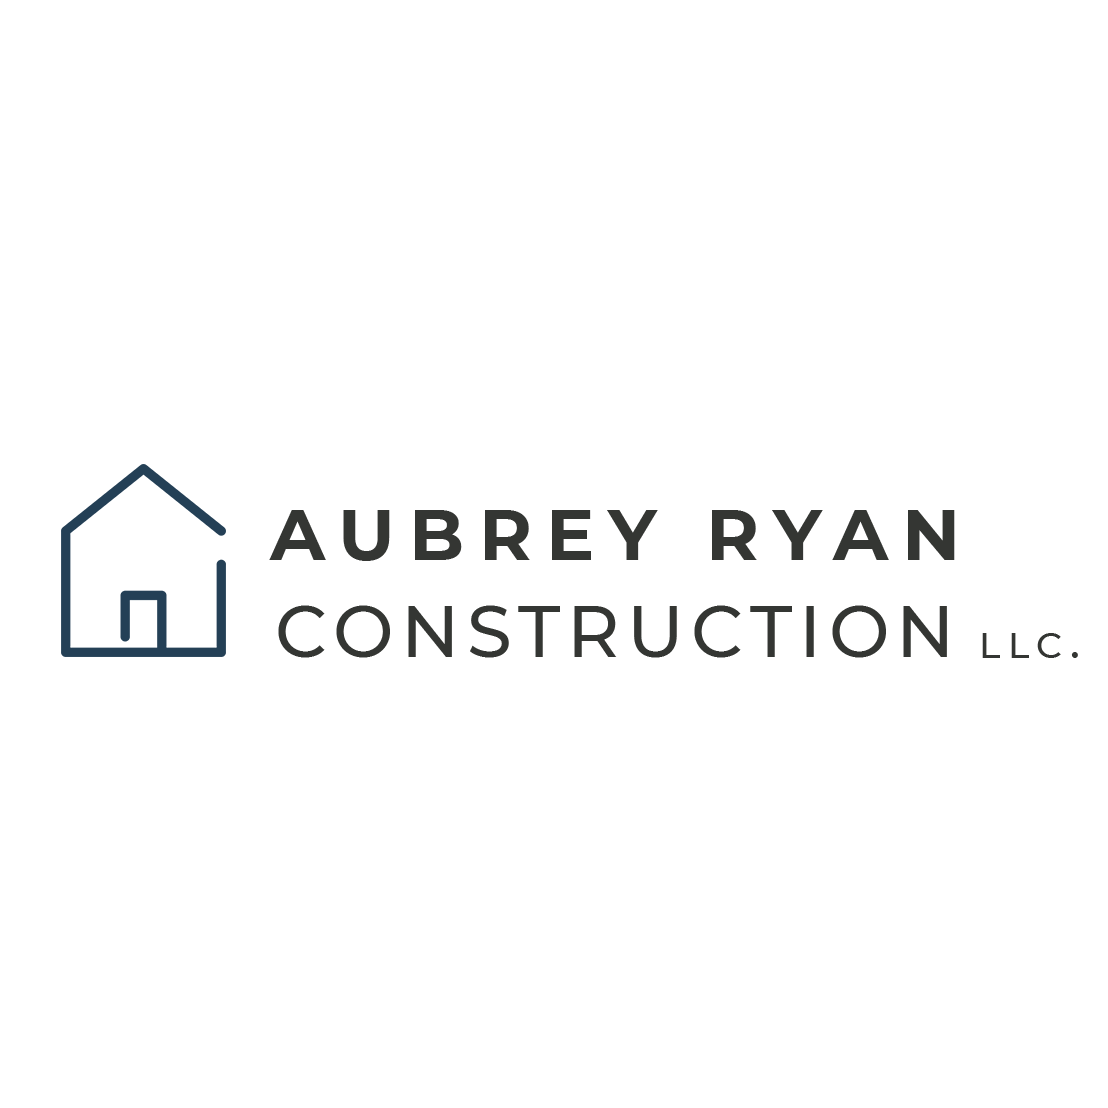 Aubrey Ryan Construction LLC